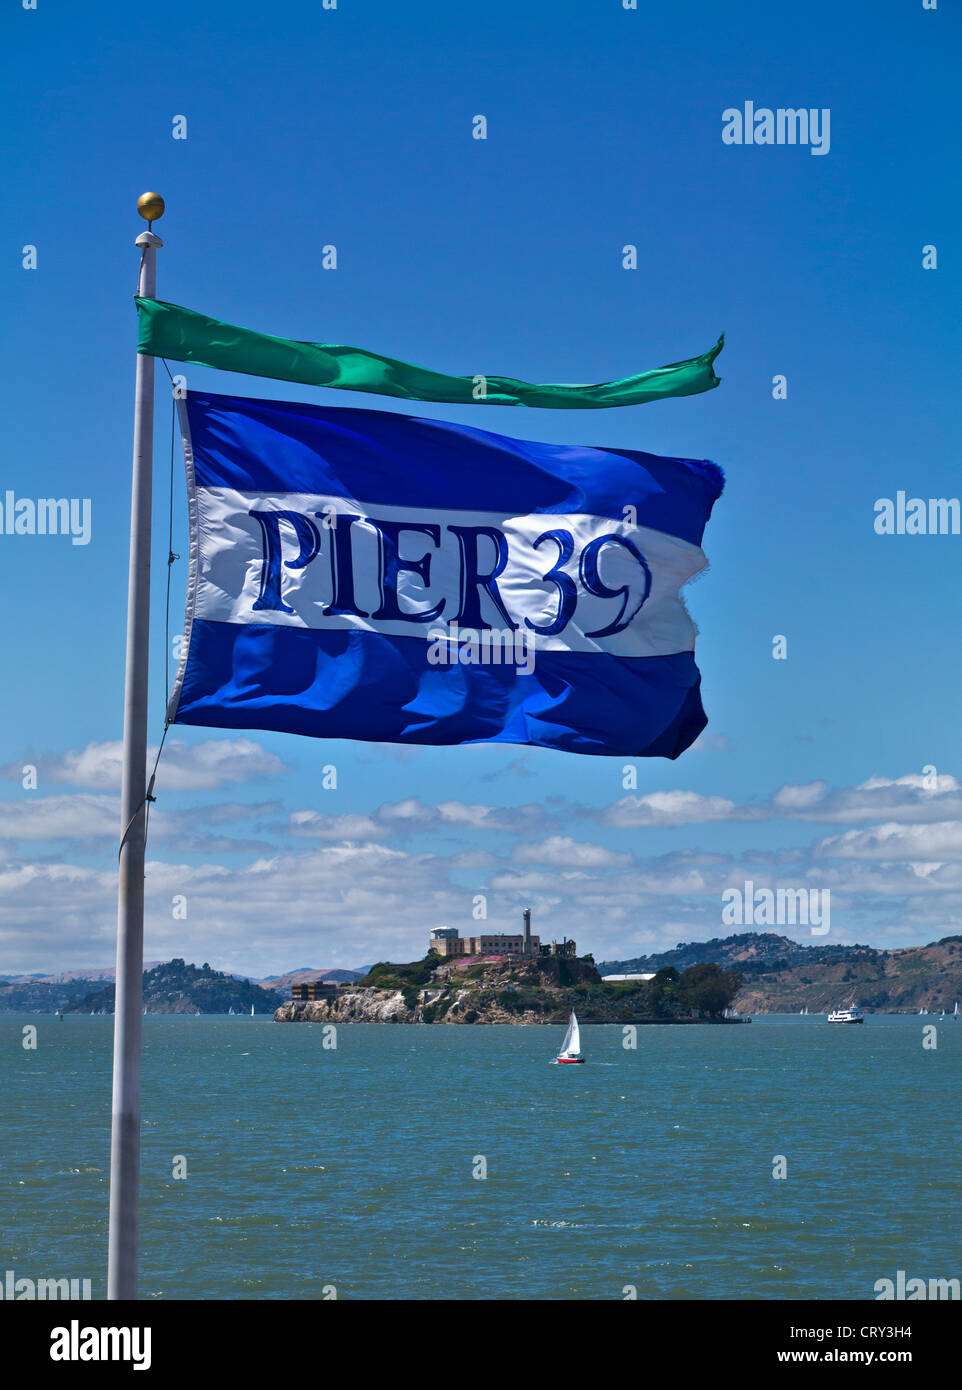 Pier 39 flag in sea breeze with Alcatraz prison island attraction and sail boat behind Embarcadero San Francisco - Stock Image